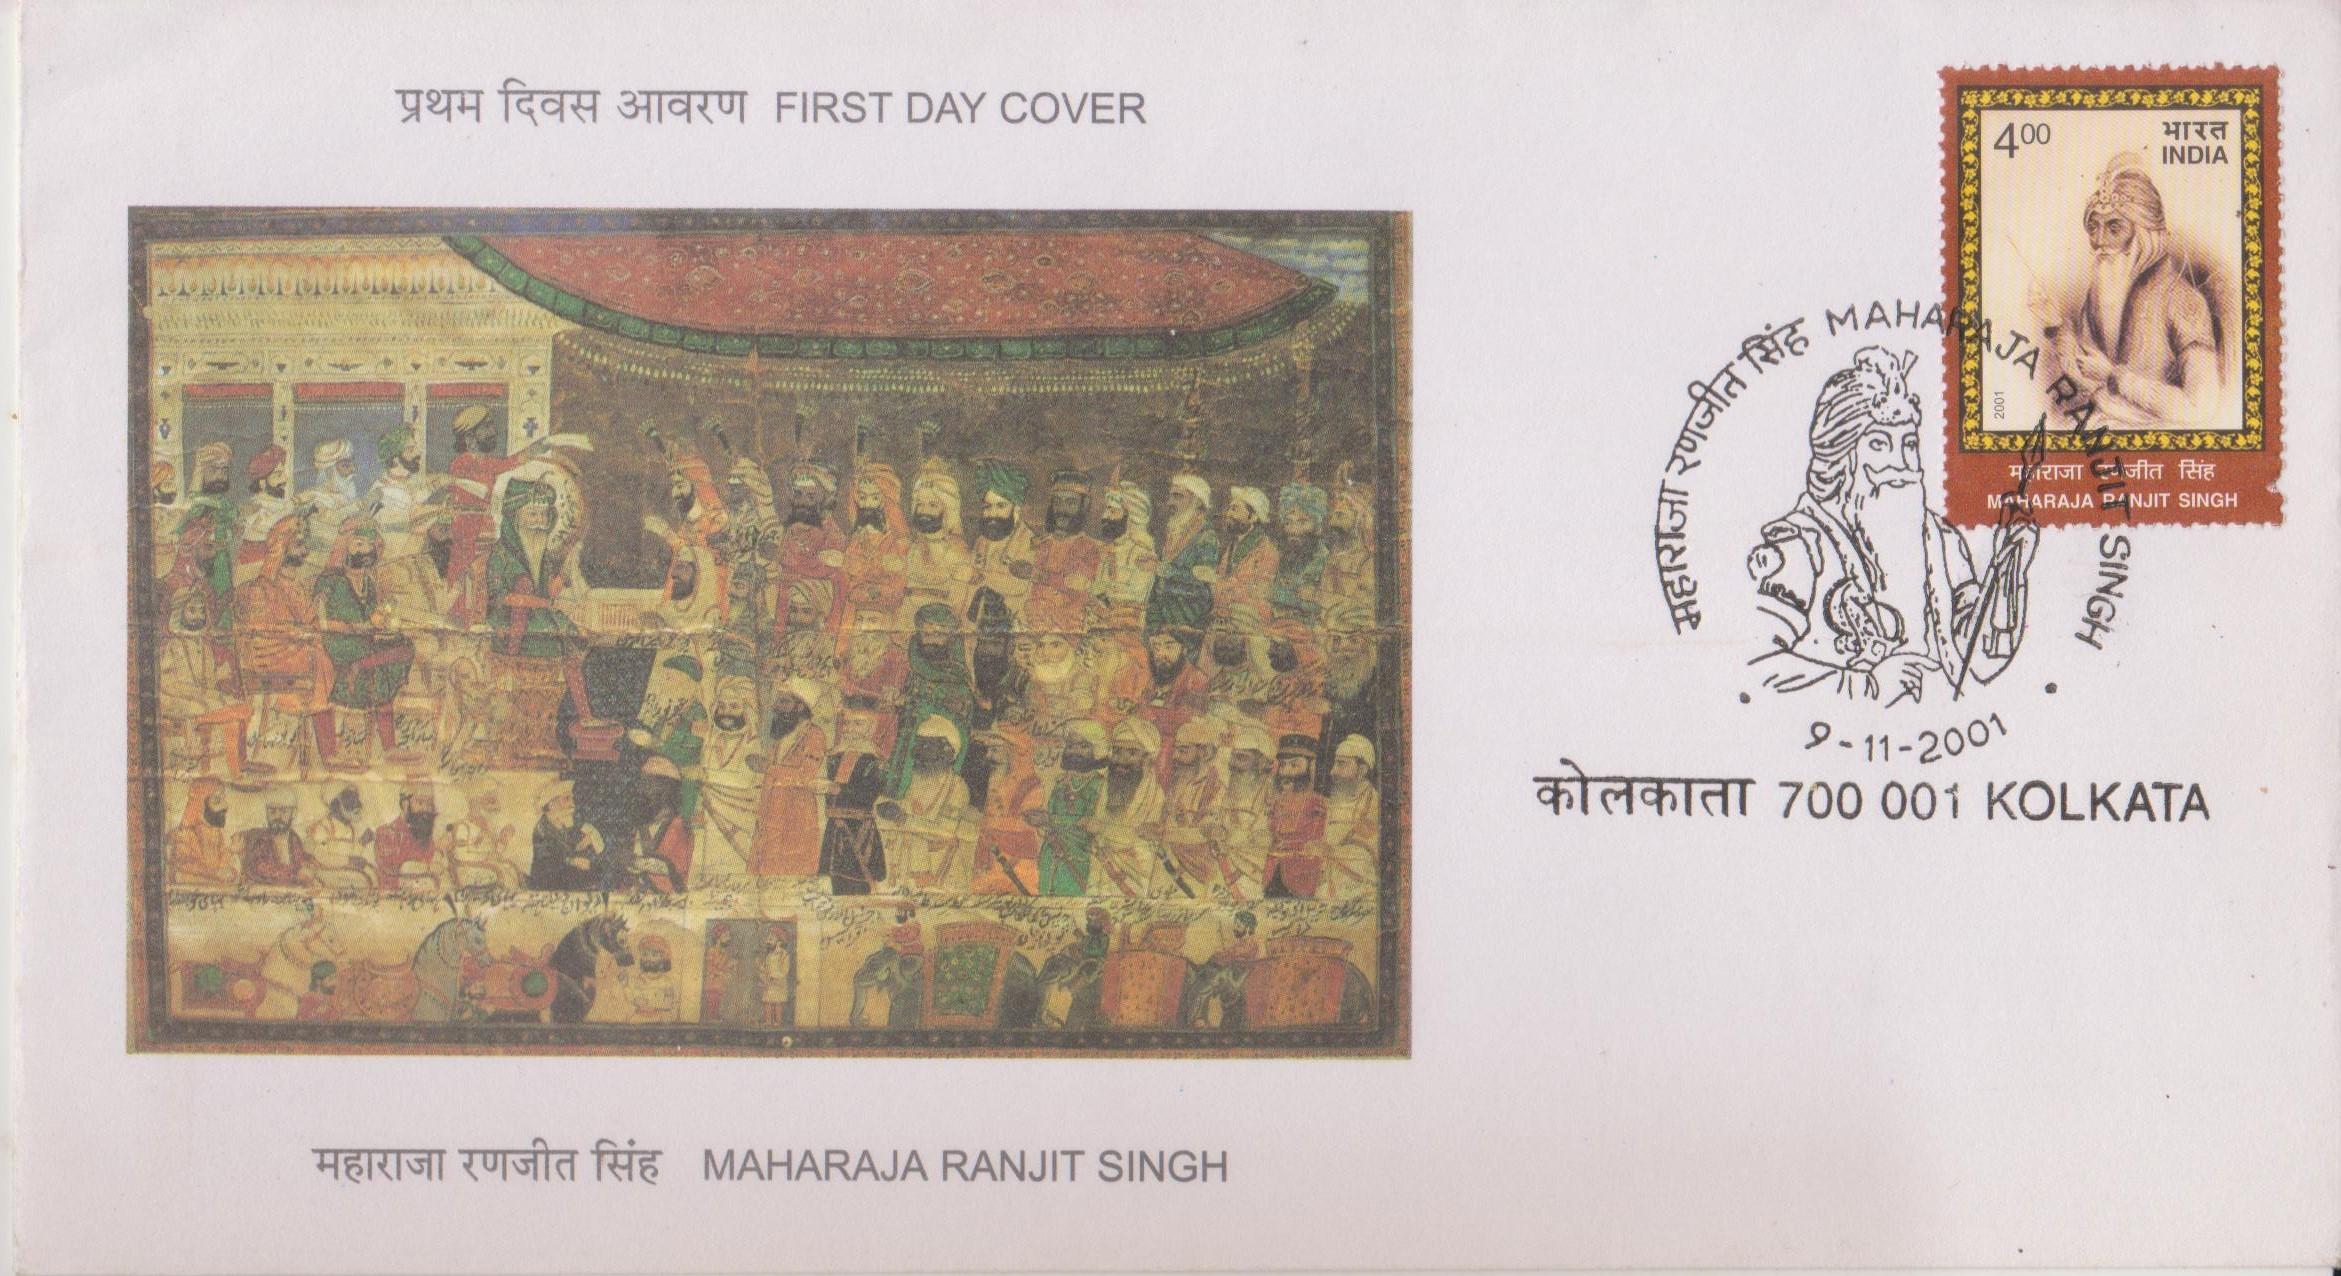 Maharaja of Punjab : Buddh Singh